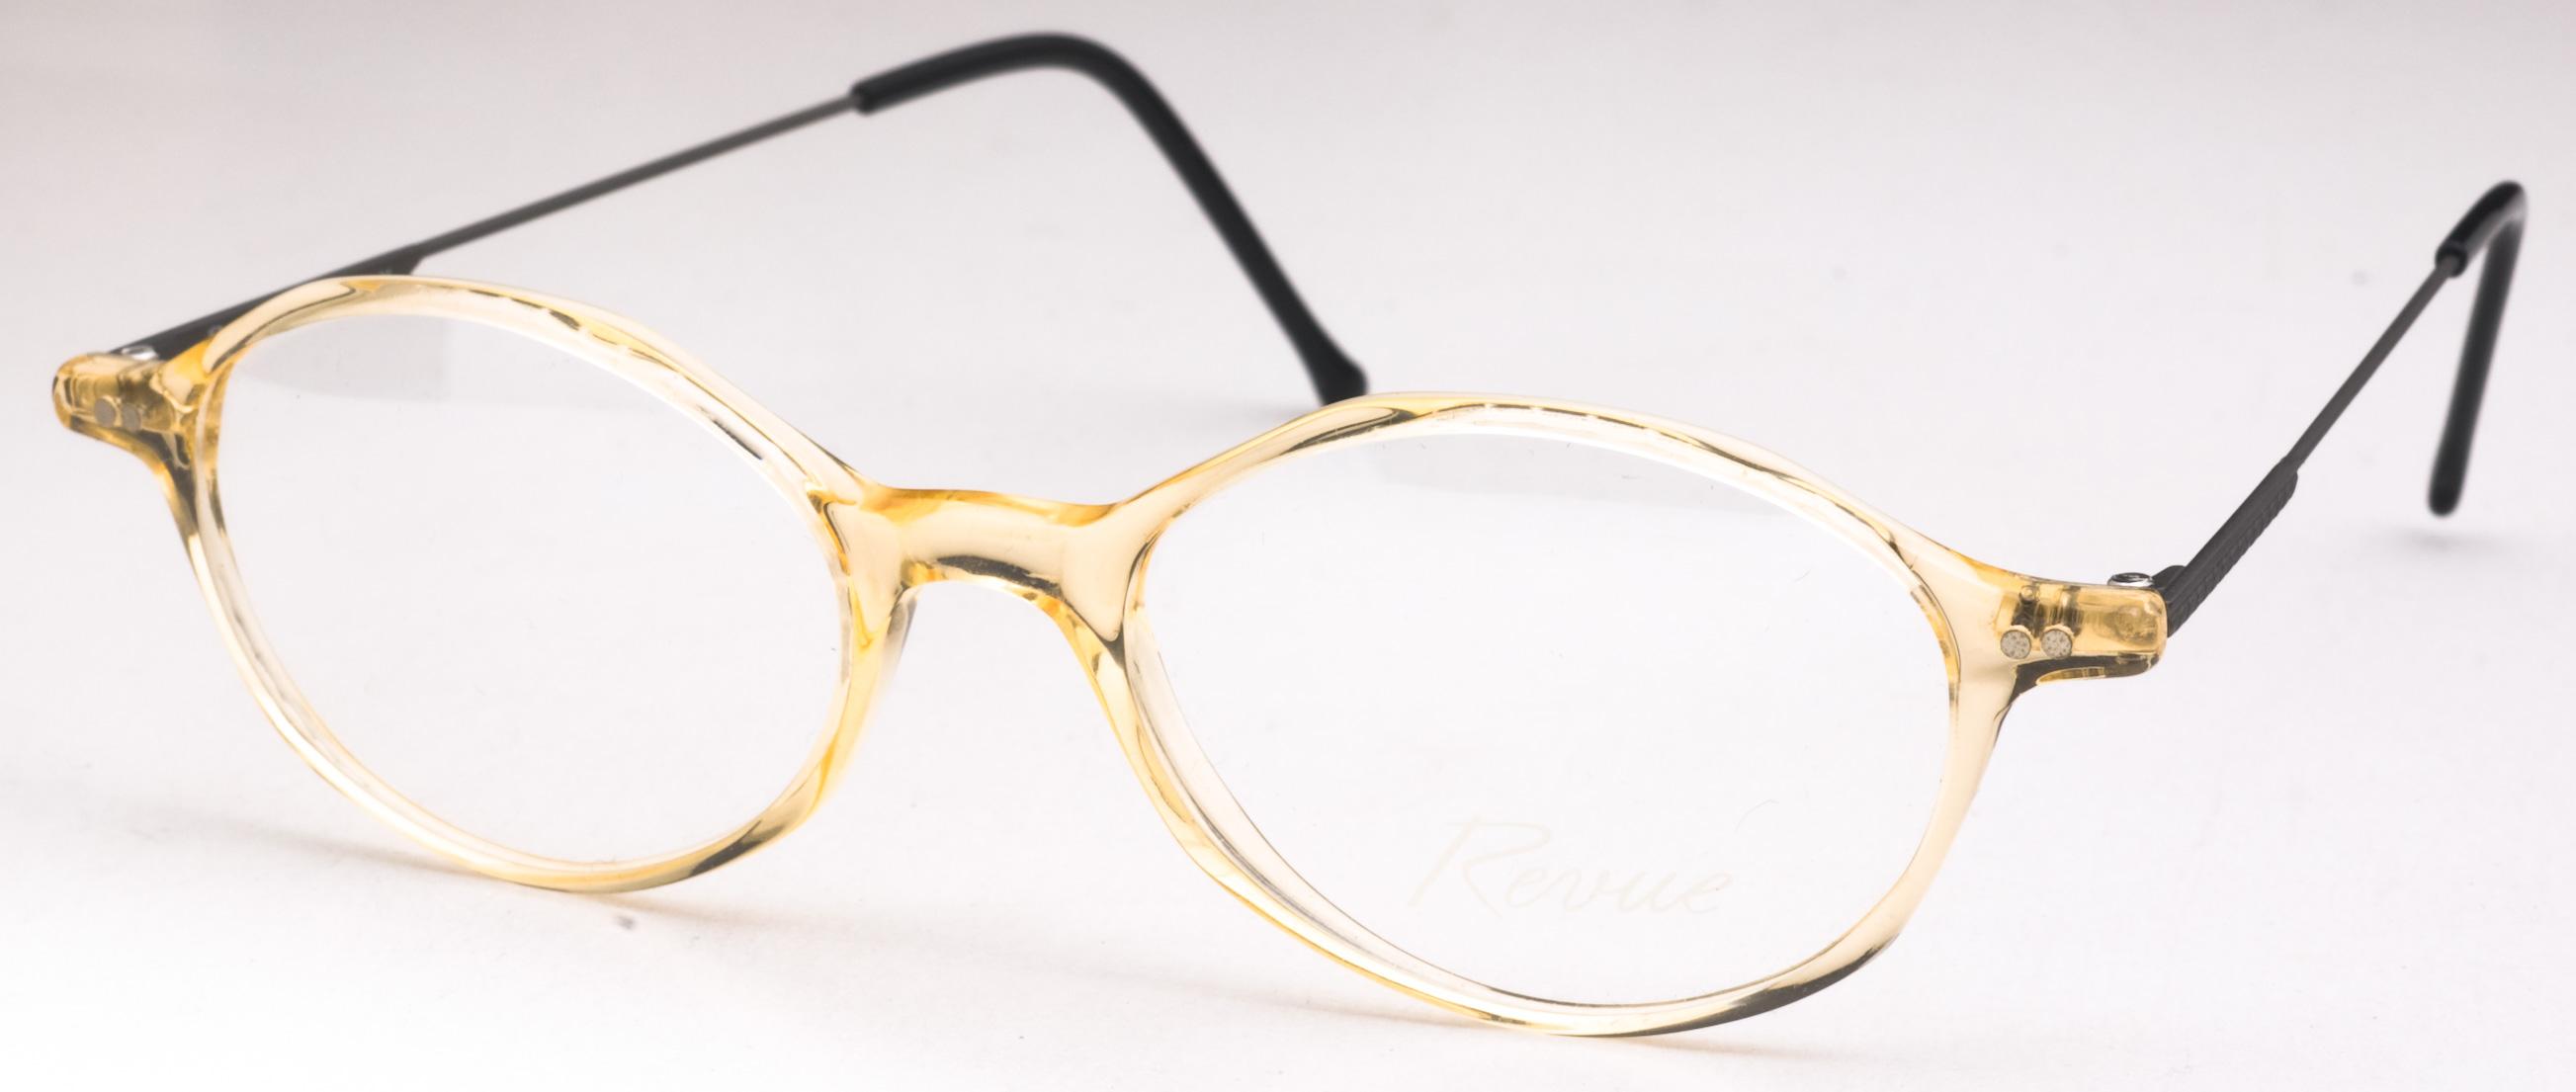 PL 6 Eyeglasses, Crystal/Gunmetal c3